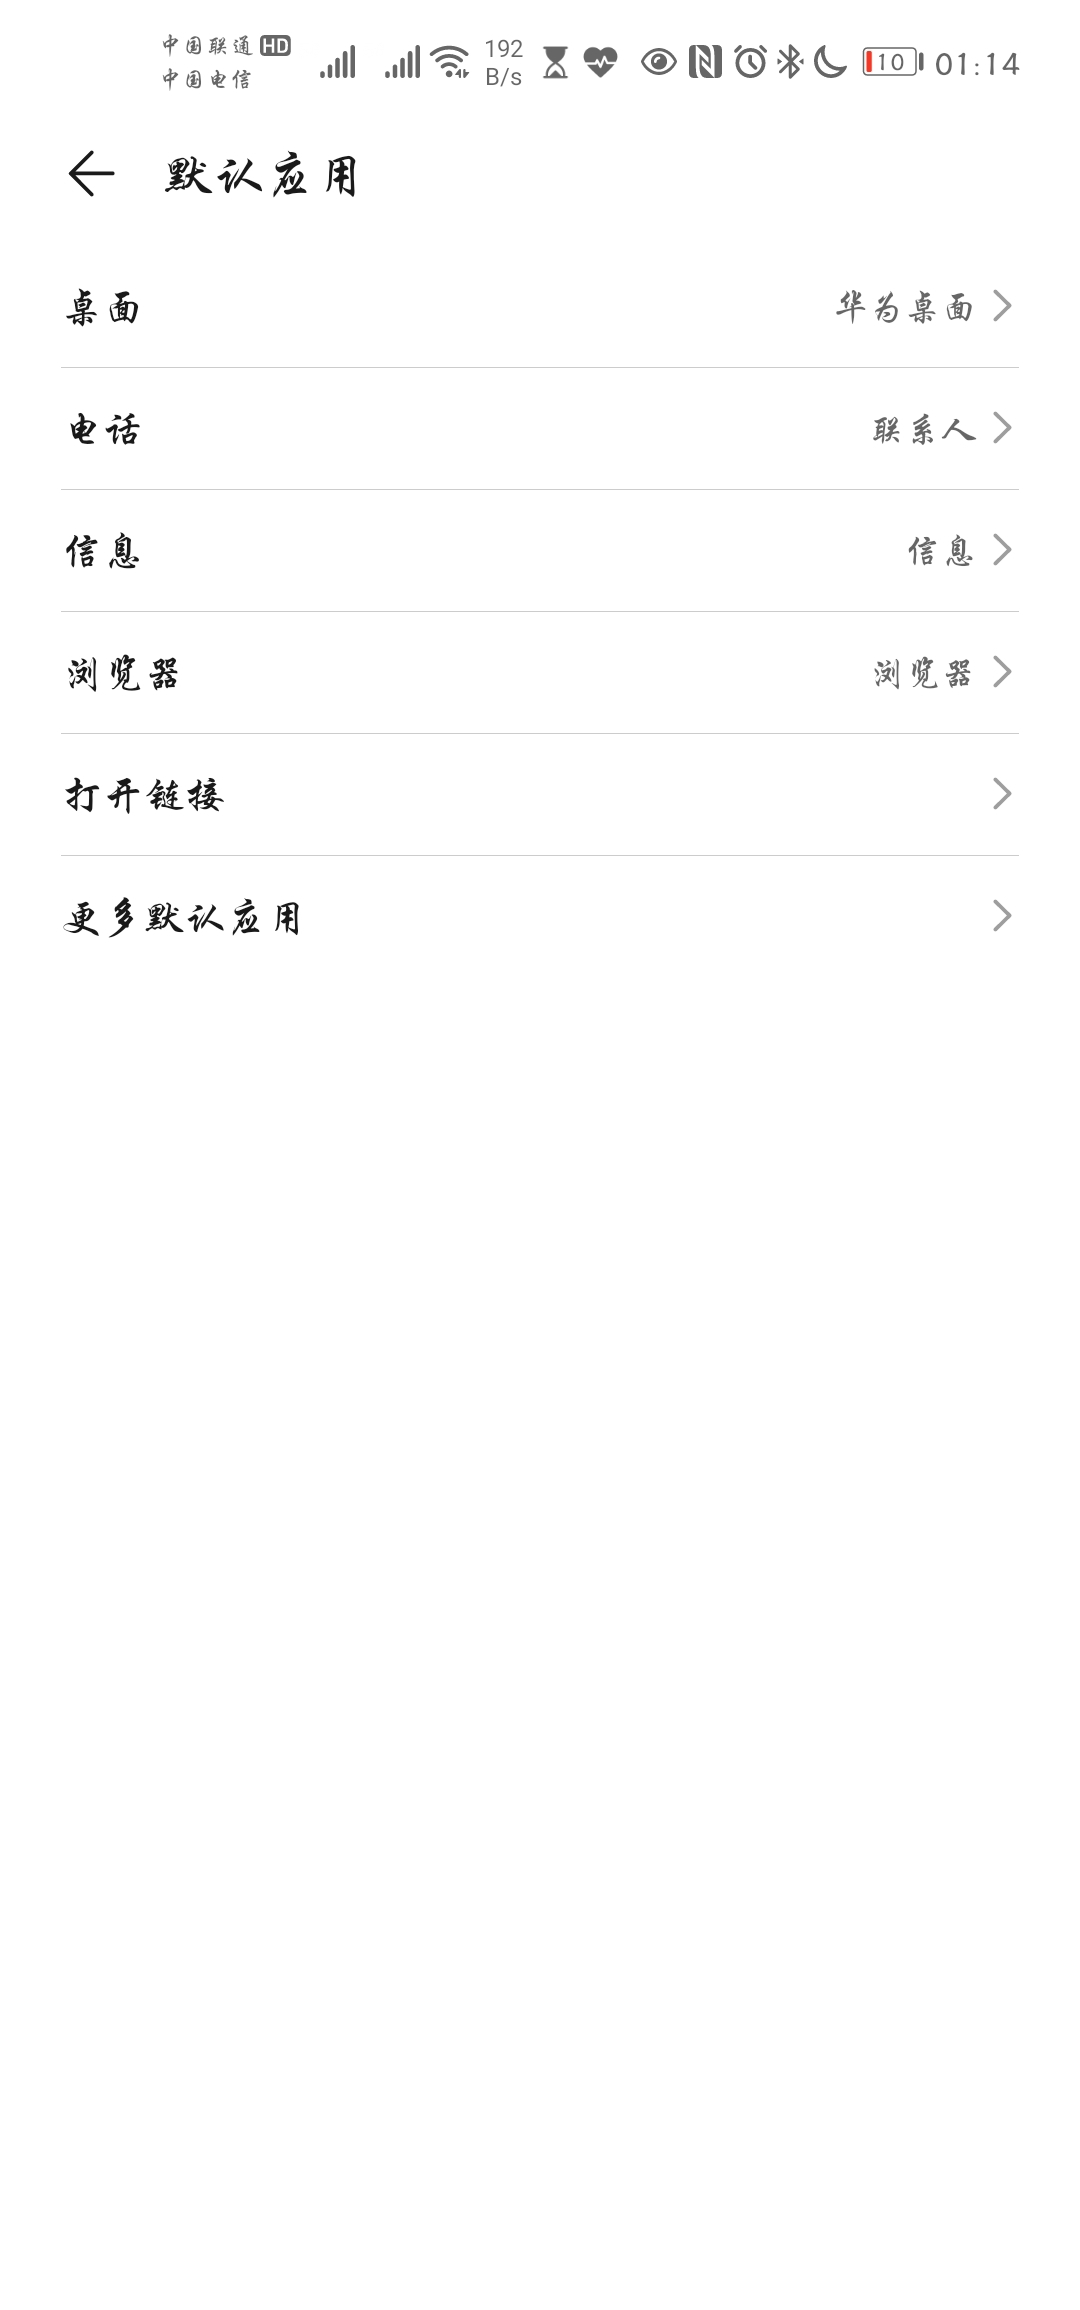 Screenshot_20200511_011450_com.android.permissioncontroller.jpg